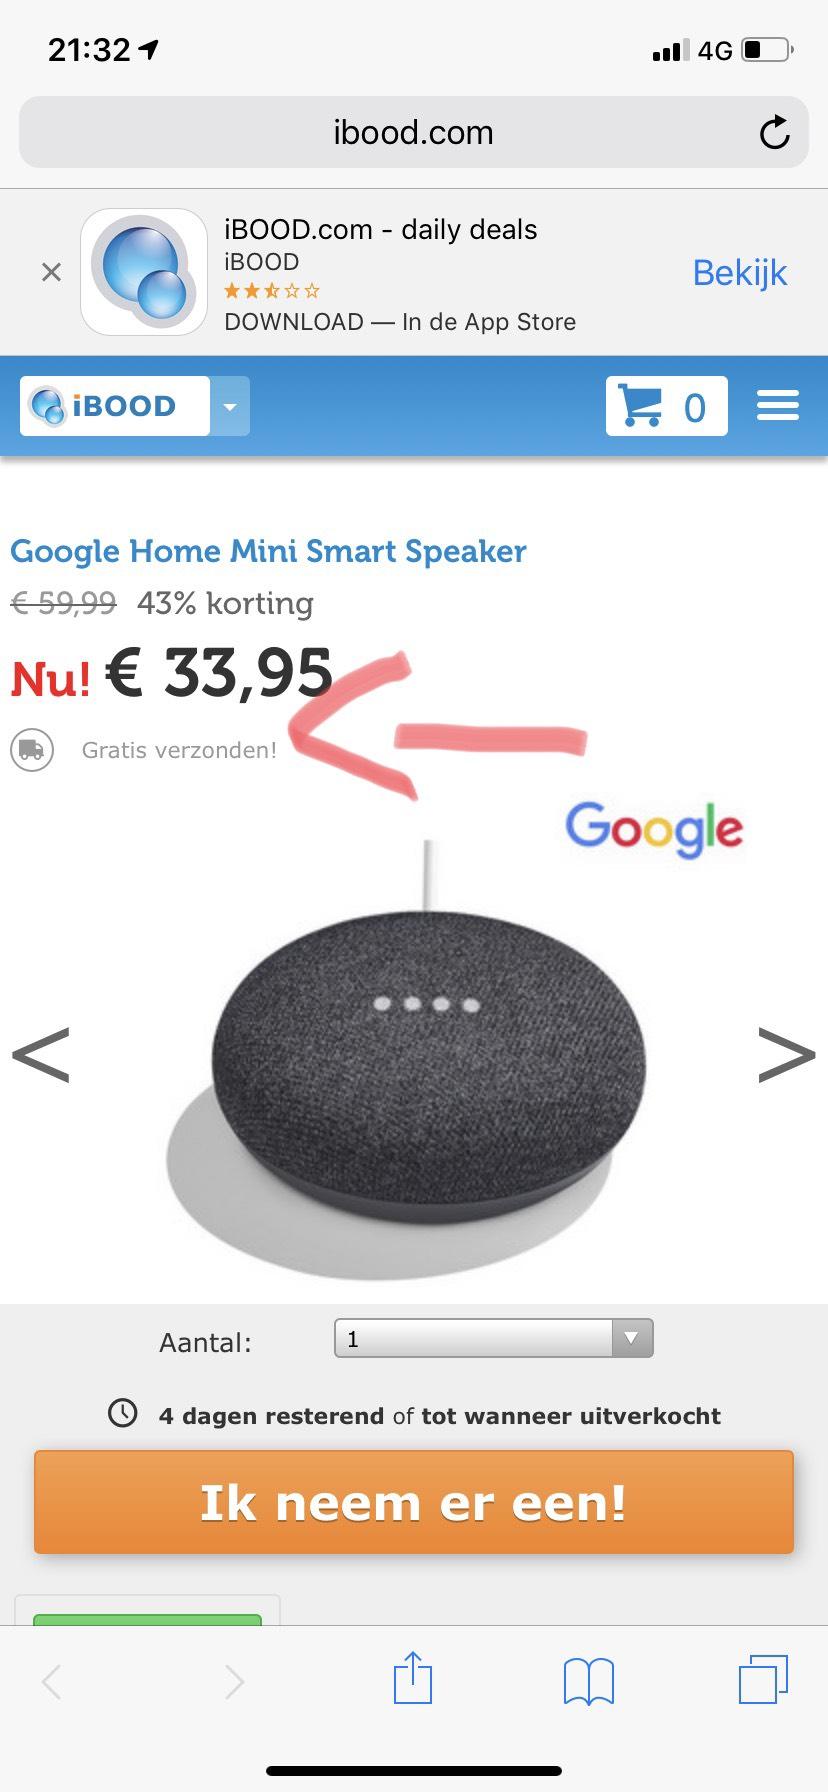 Google Home Mini Smart Speaker @Ibood